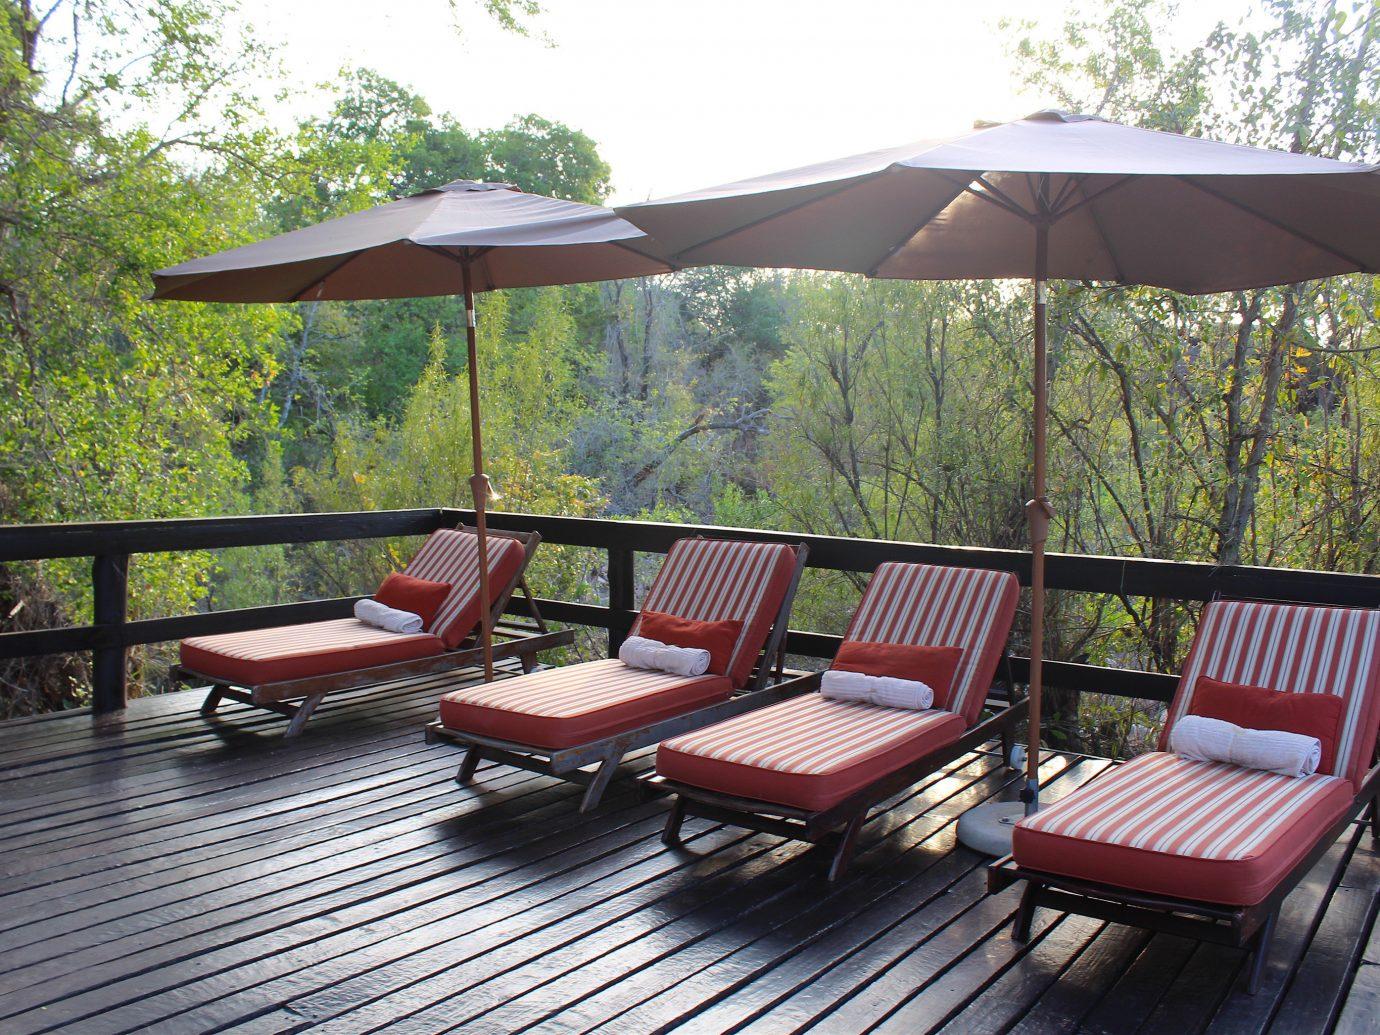 Outdoors + Adventure Safaris Trip Ideas tree table outdoor umbrella chair gazebo outdoor structure canopy backyard area Deck set furniture shade